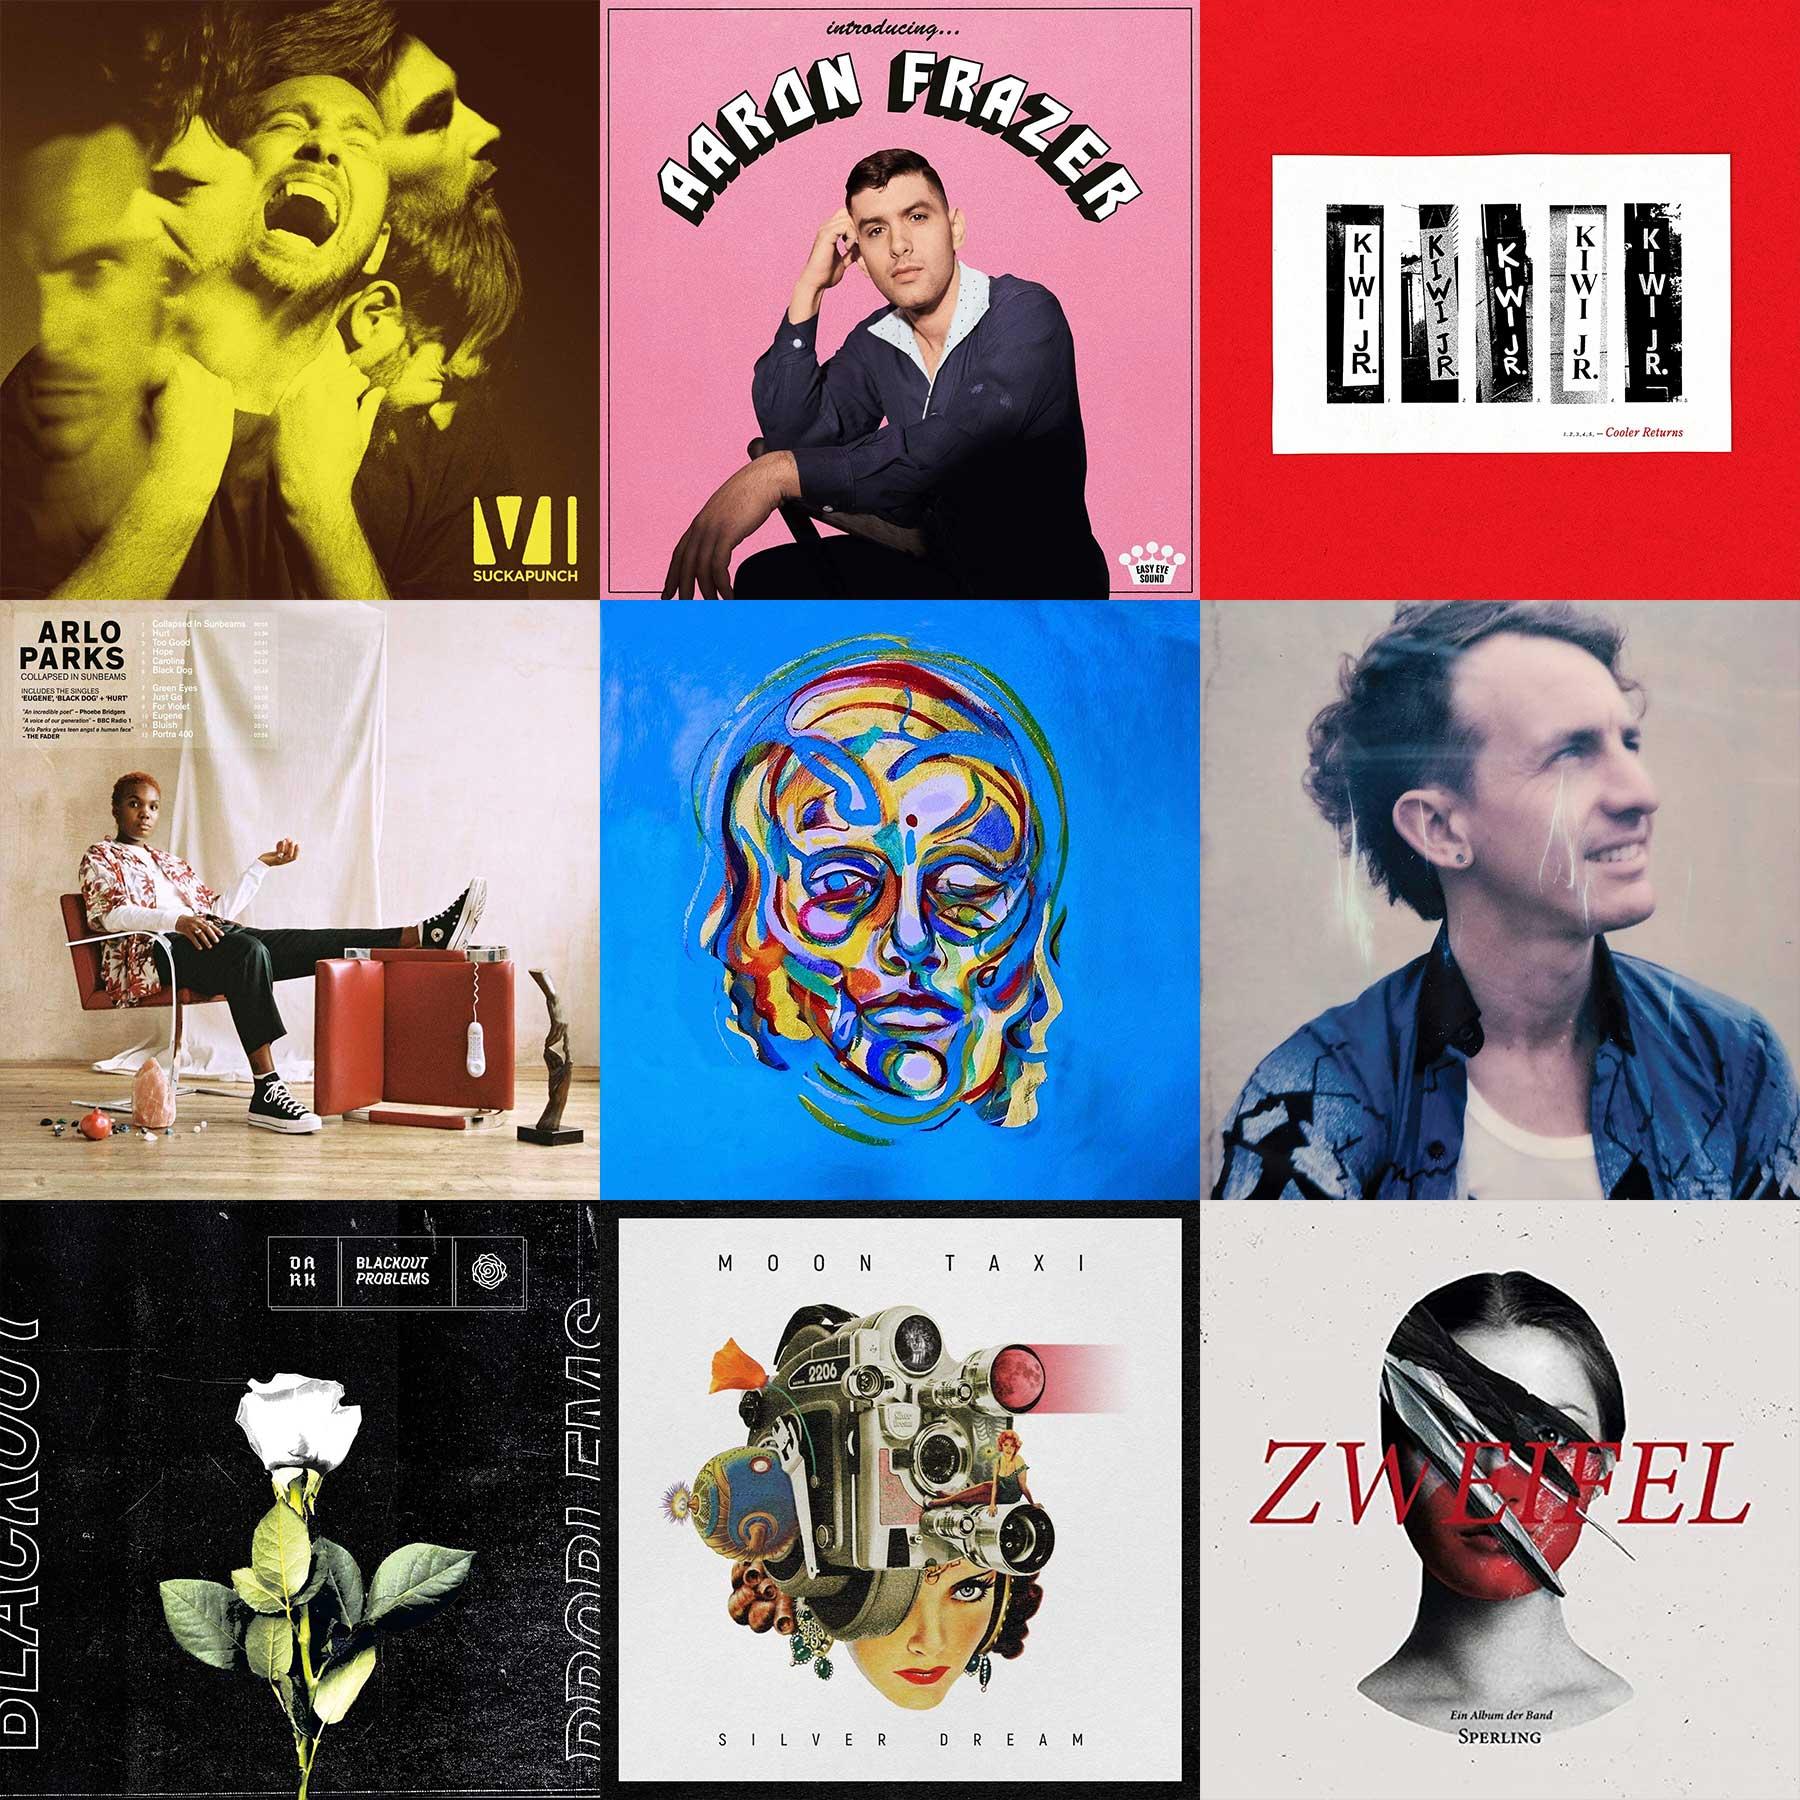 Kurzreviews: Neue Musikalben im Januar 2021 musikalben-kurzreviews-januar-2021